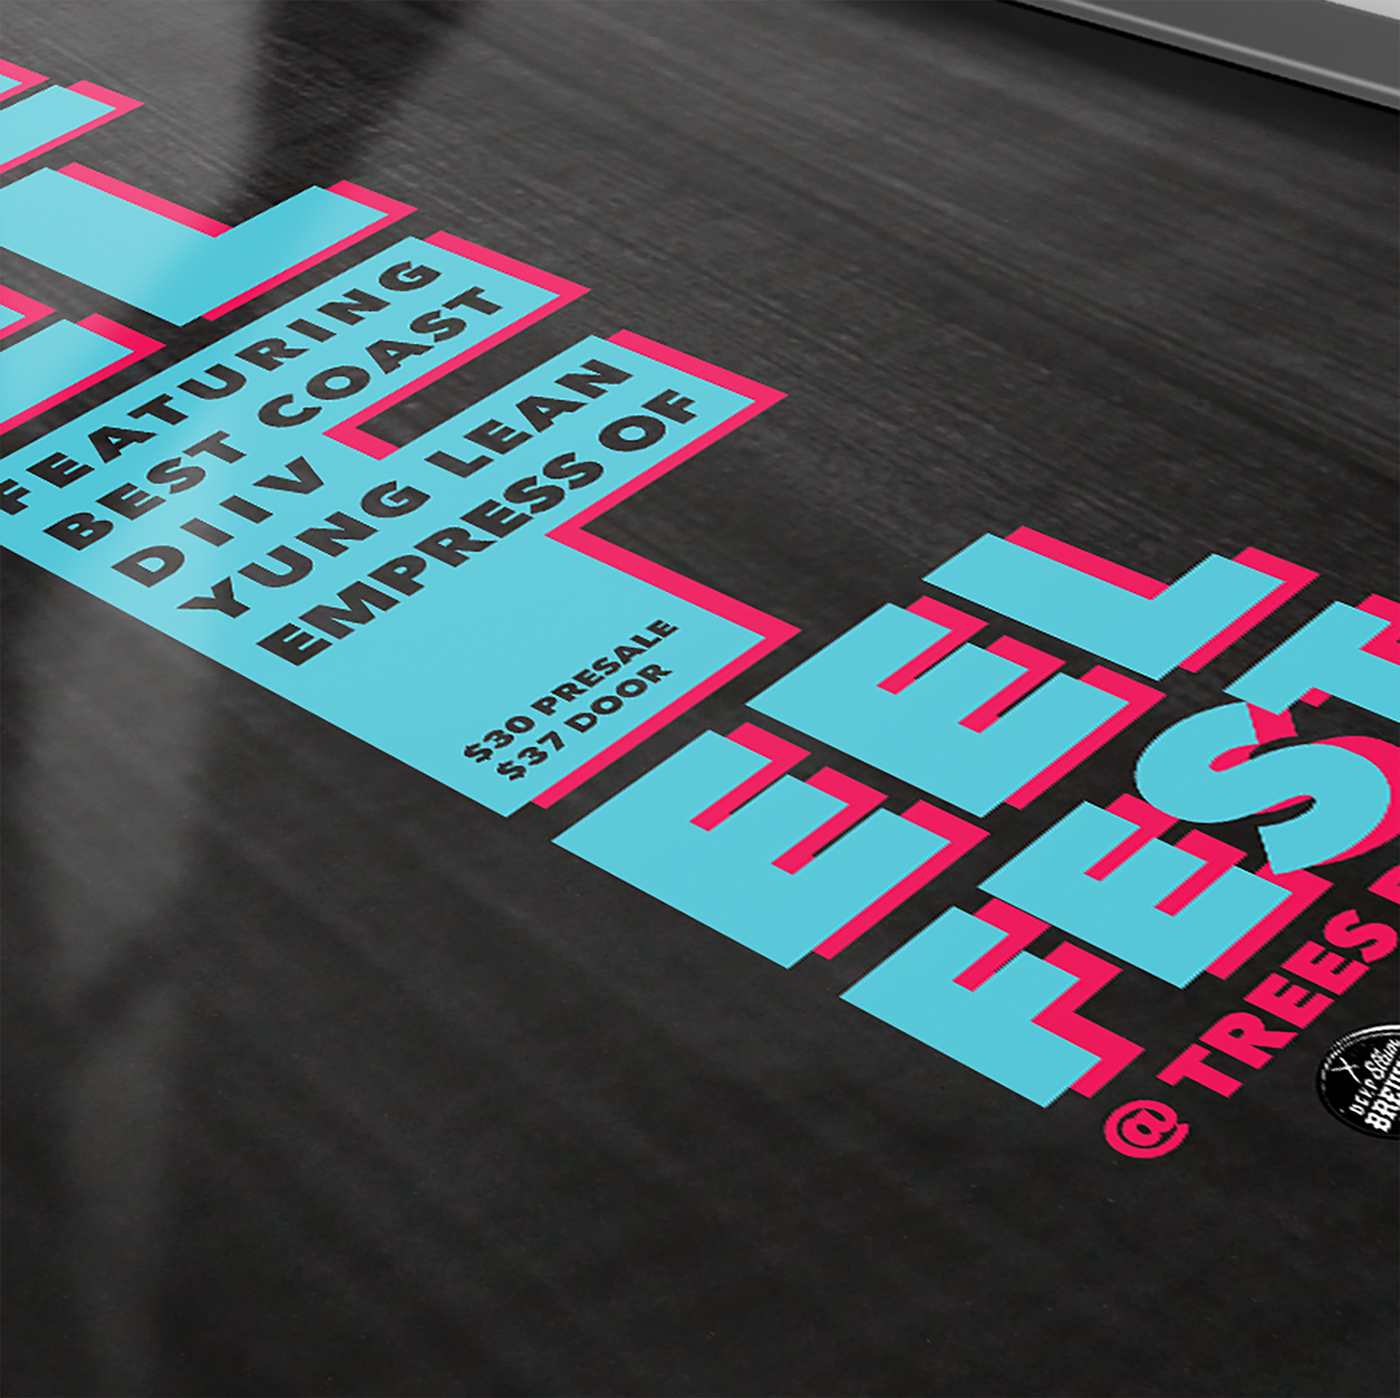 Feel Feel Feel Music Festival festival dallas poster ticket button tshirt mock-up